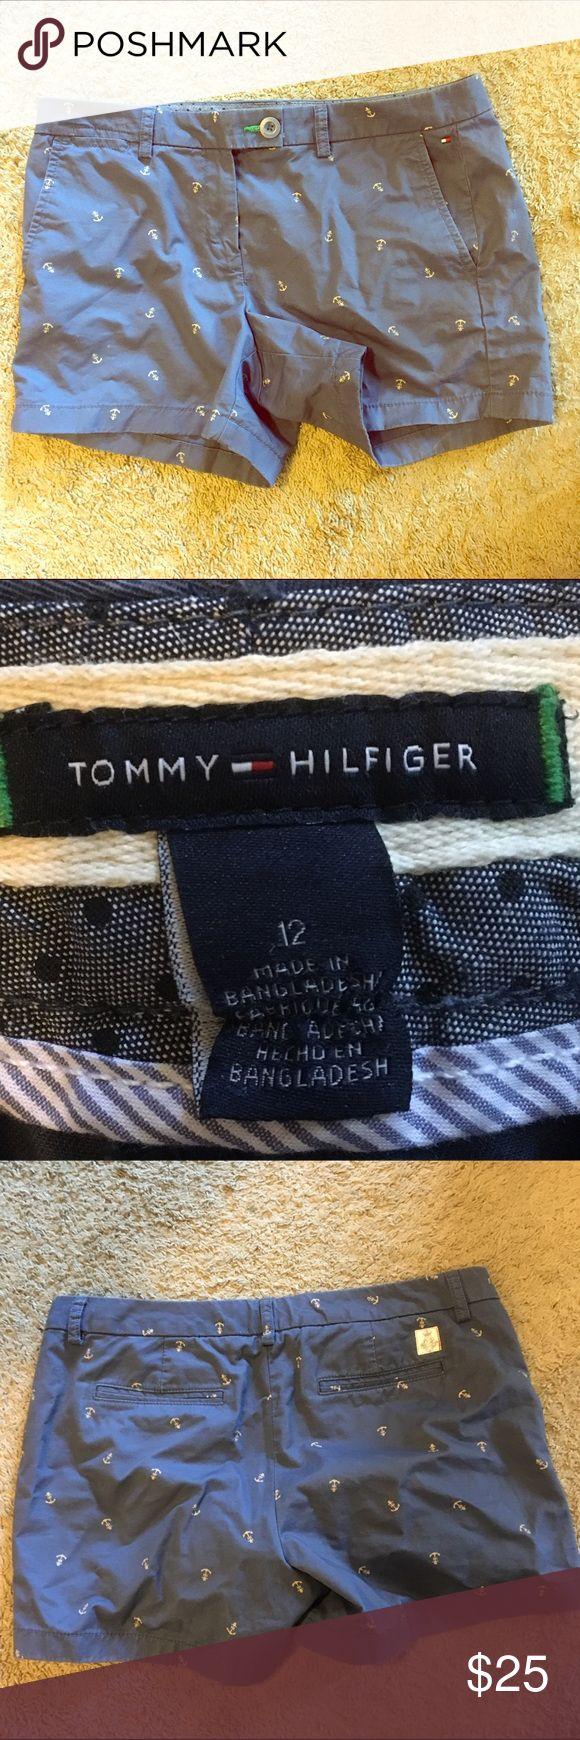 Tommy Hilfiger Navy Blue Shorts Anchor ⚓️ 12 Tommy Hilfiger Navy Blue Shorts Anchor ⚓️ 12 Tommy Hilfiger Shorts